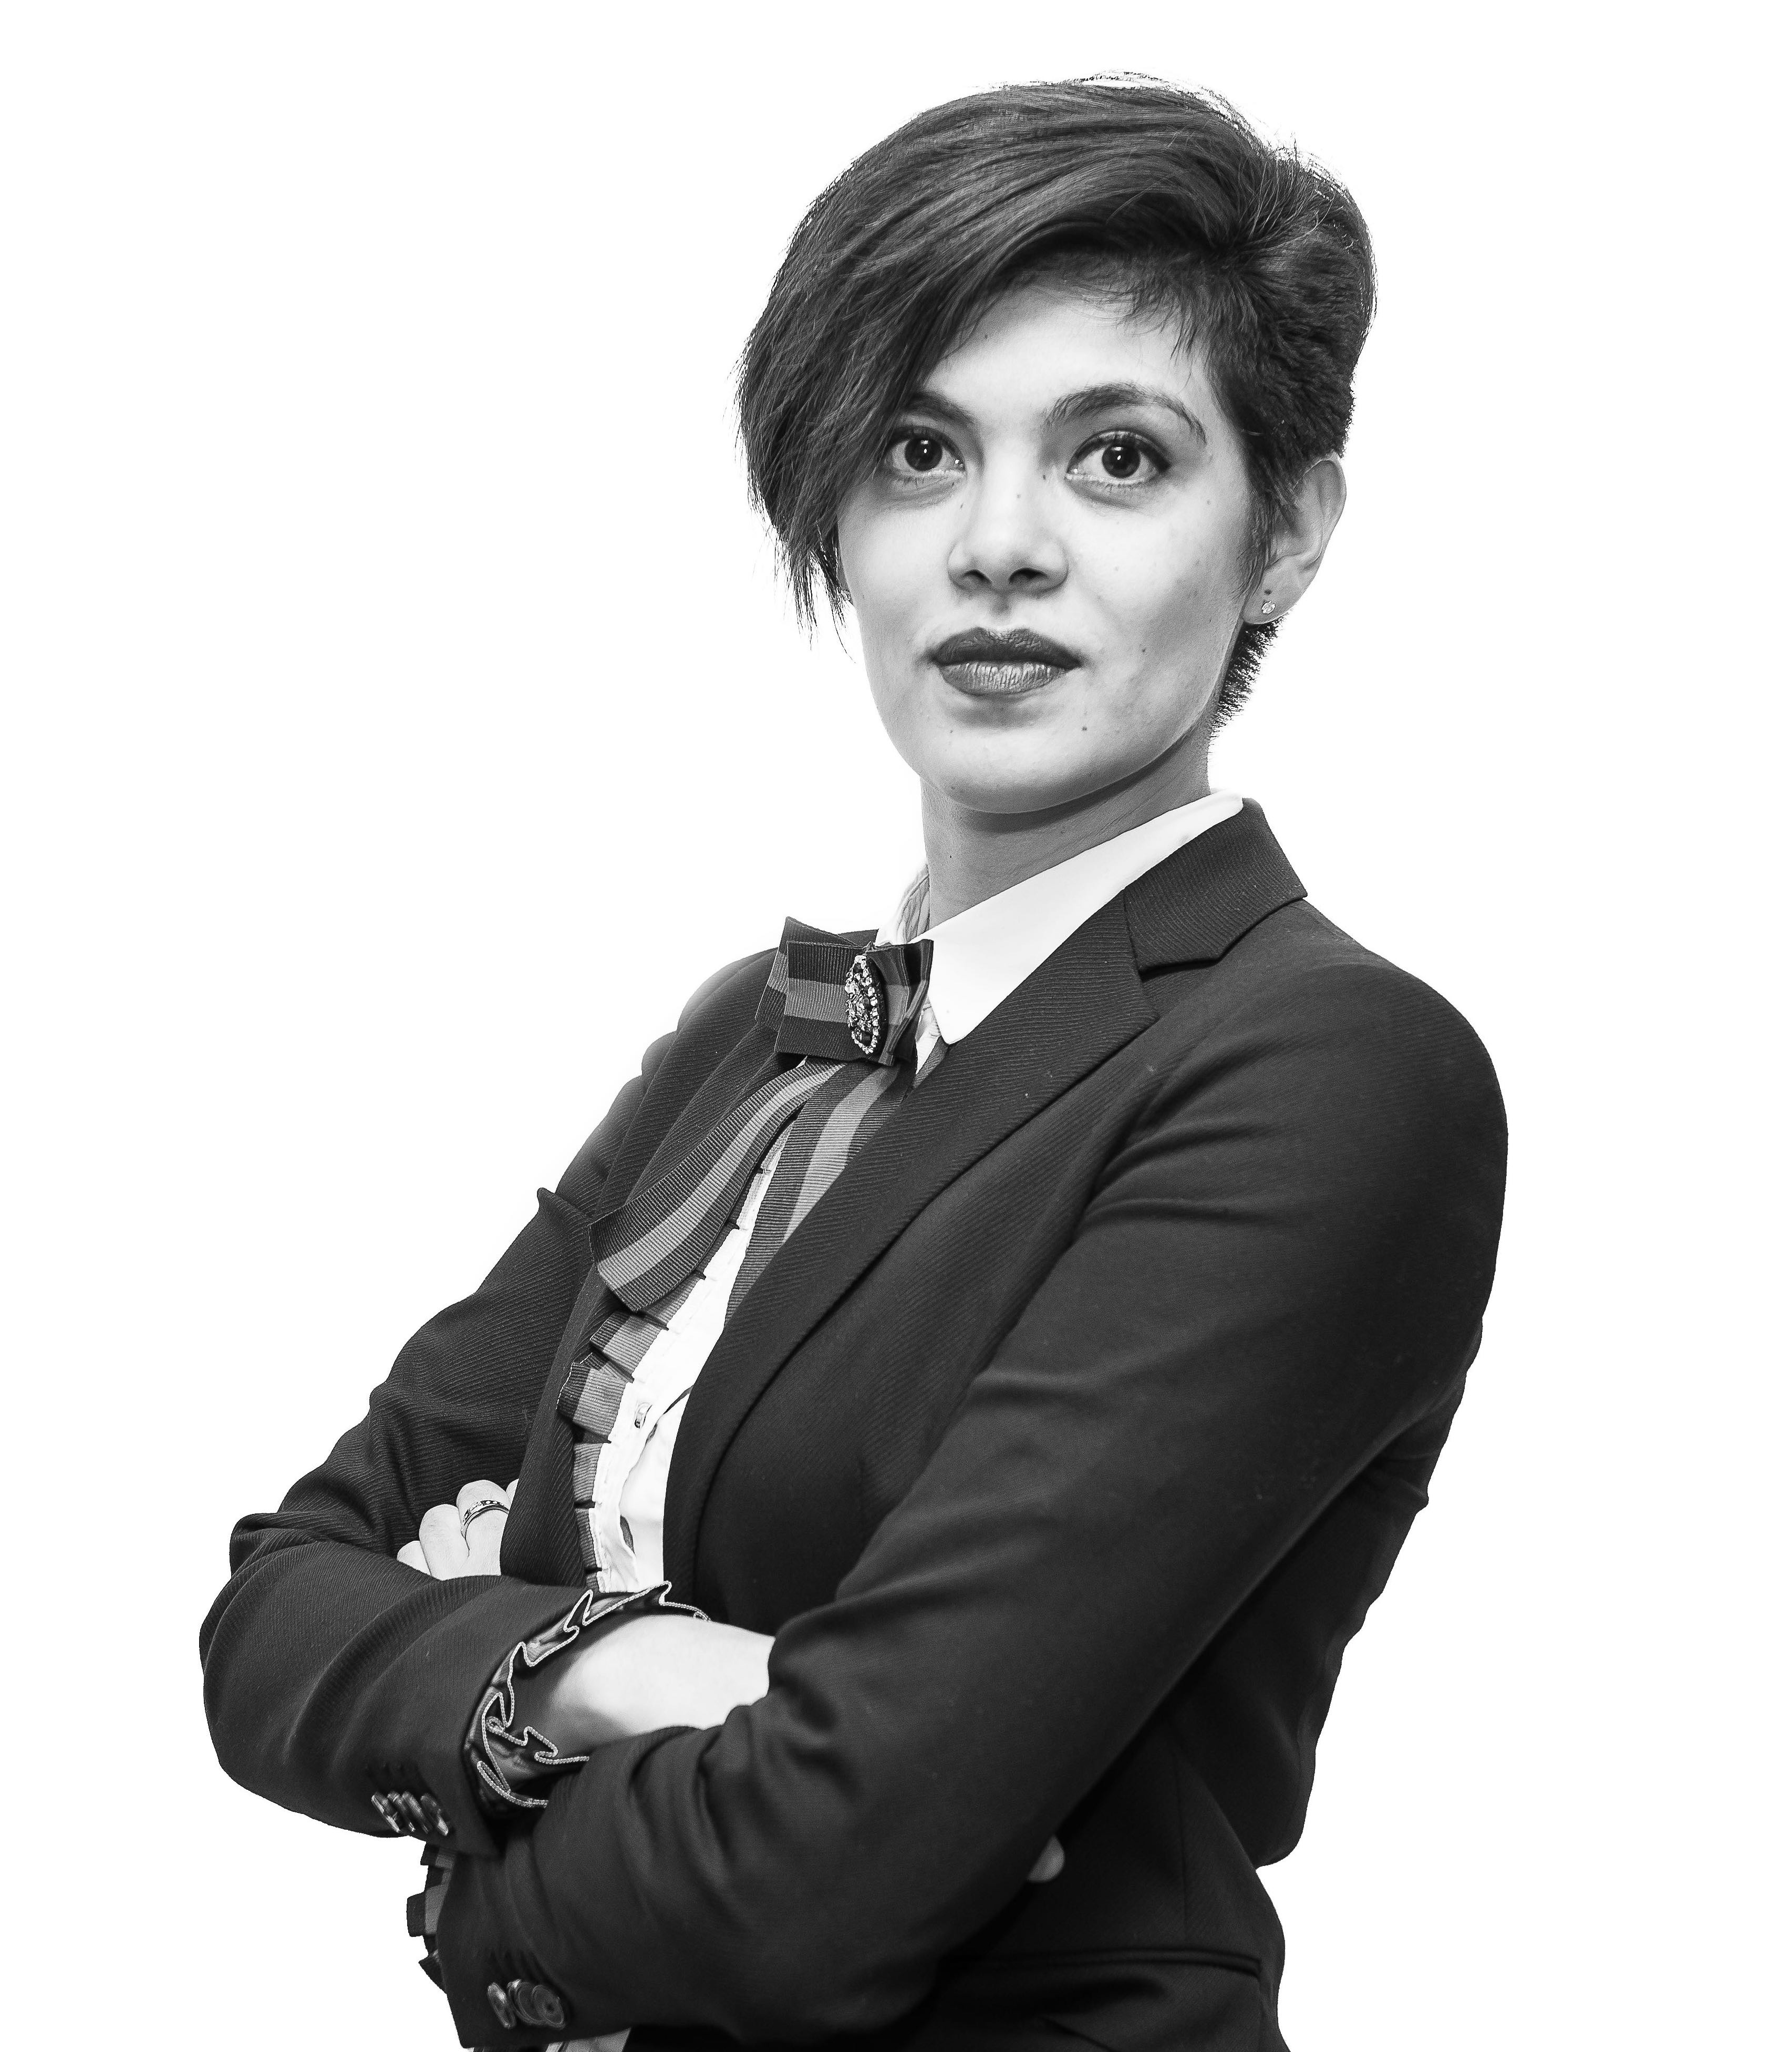 Esther Elizabeth Albarrán Martínez